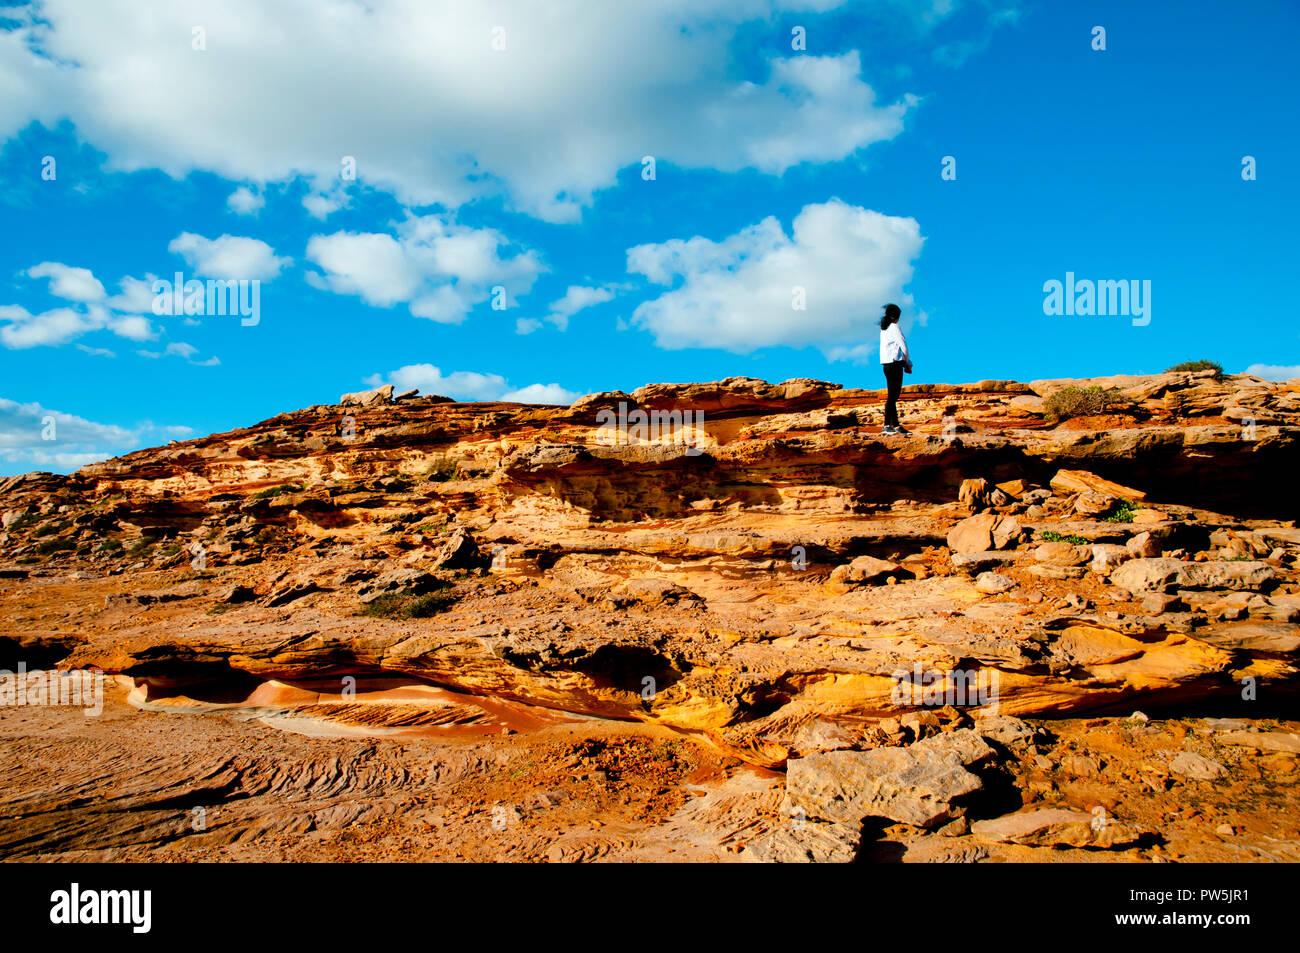 Red Bluff Sandstone - Kalbarri - Australia - Stock Image